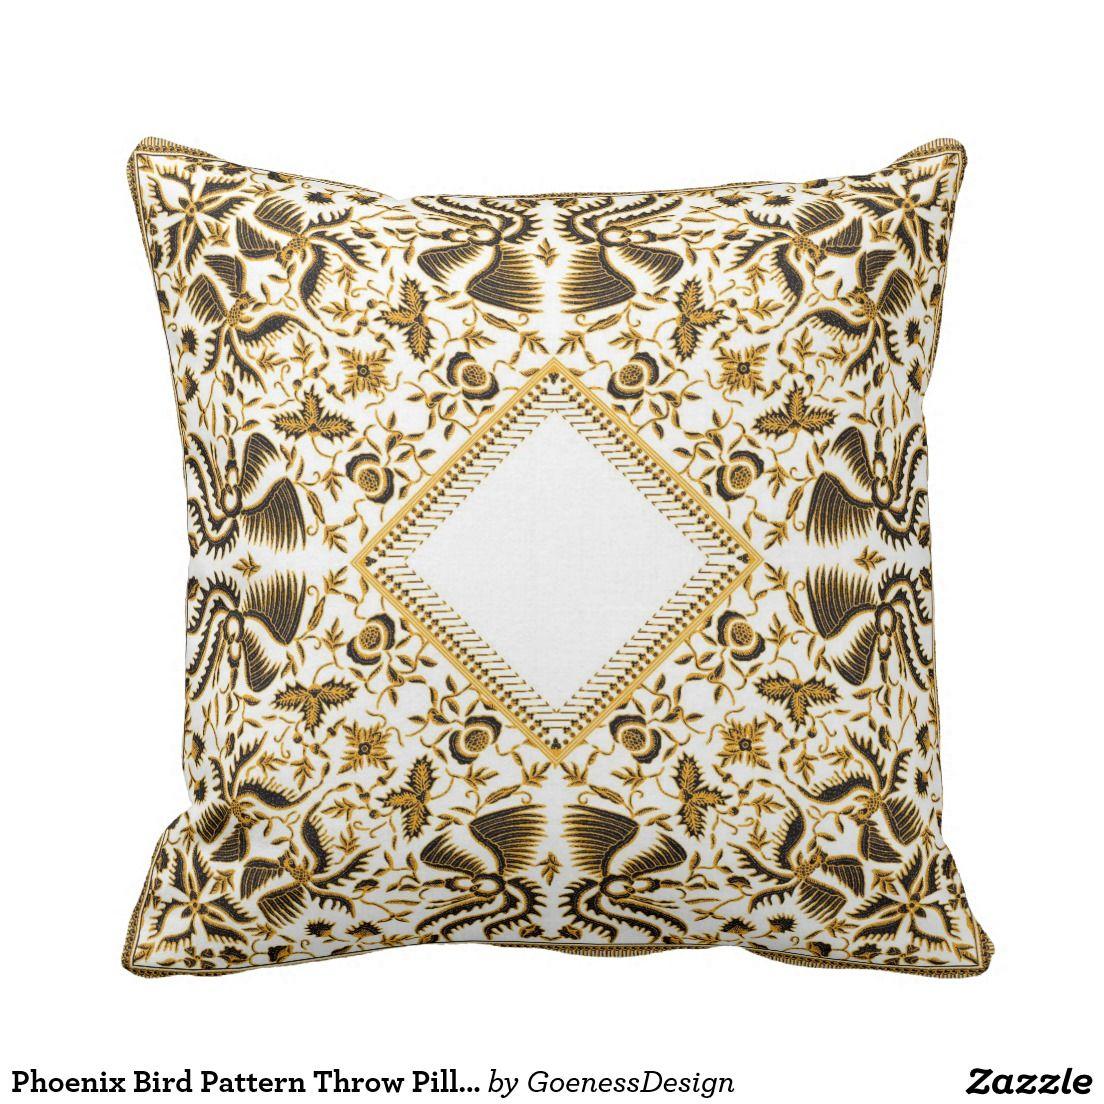 Küchendesign-logo phoenix bird pattern throw pillow  phoenix bird